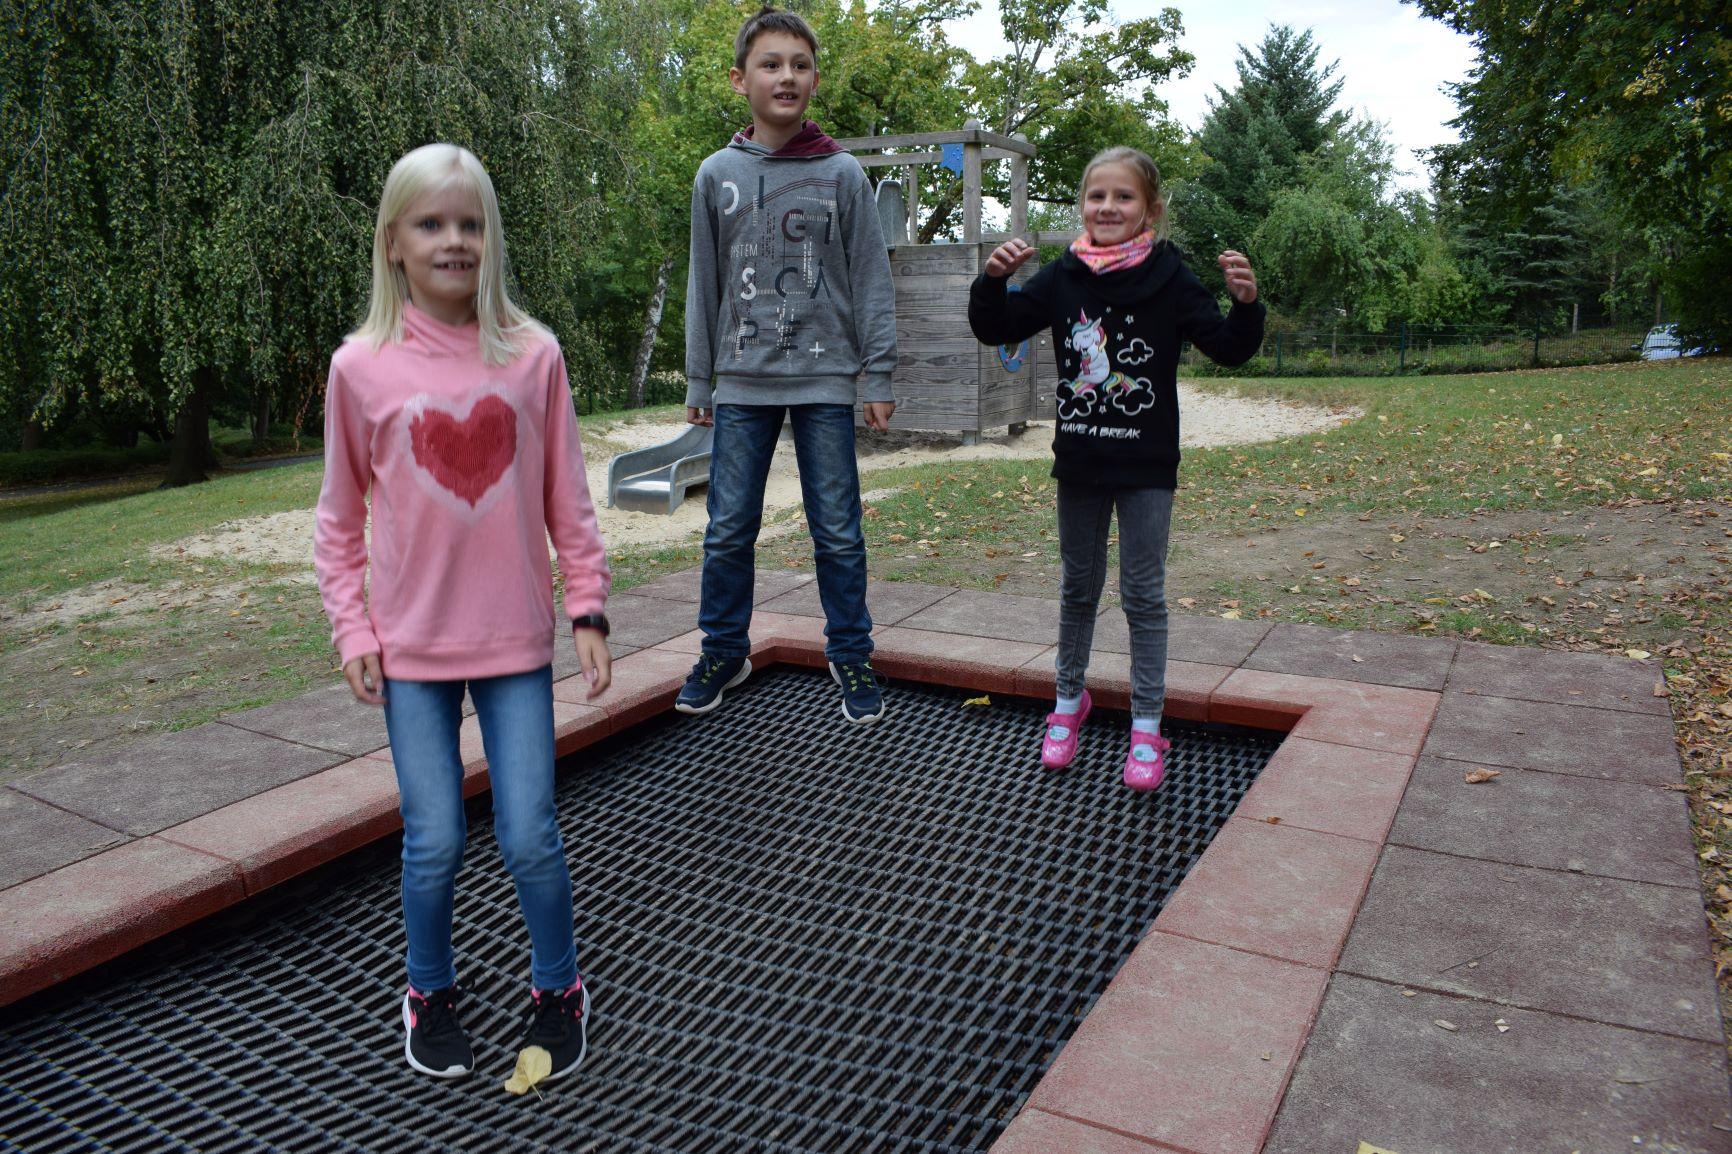 Lia, 3a, Theodore, 4. und Alina, 3b haben Spaß (v.l.)